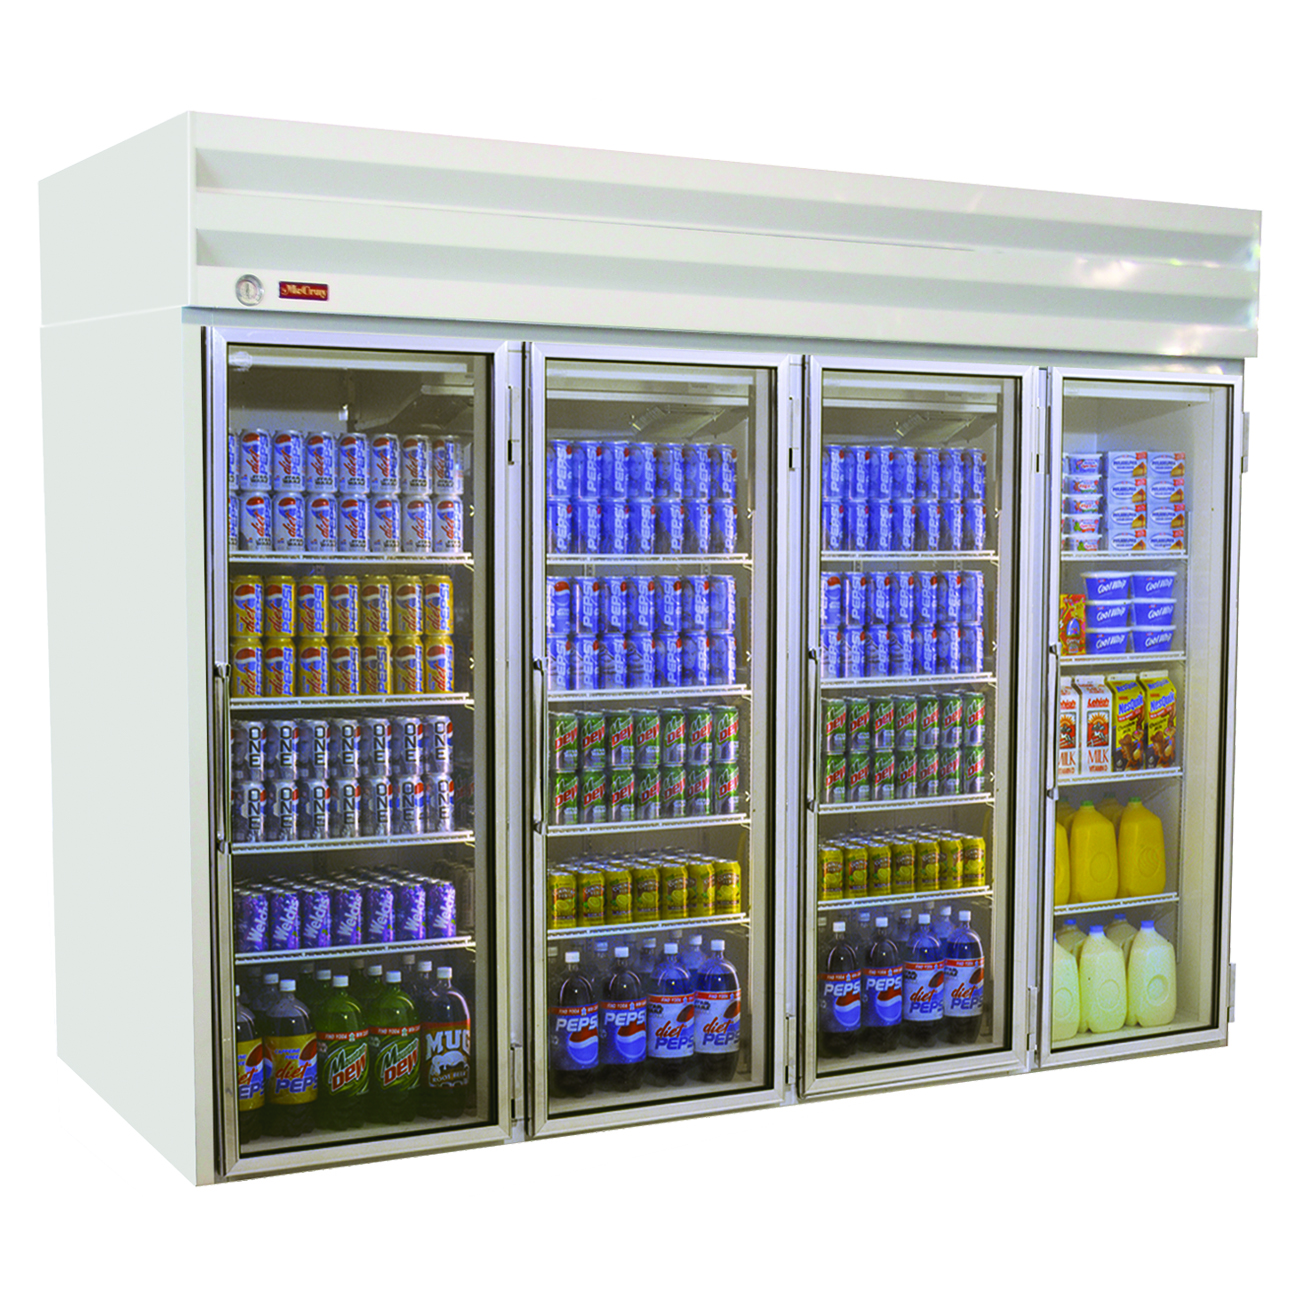 Howard-McCray GF102-FF-B freezer, merchandiser